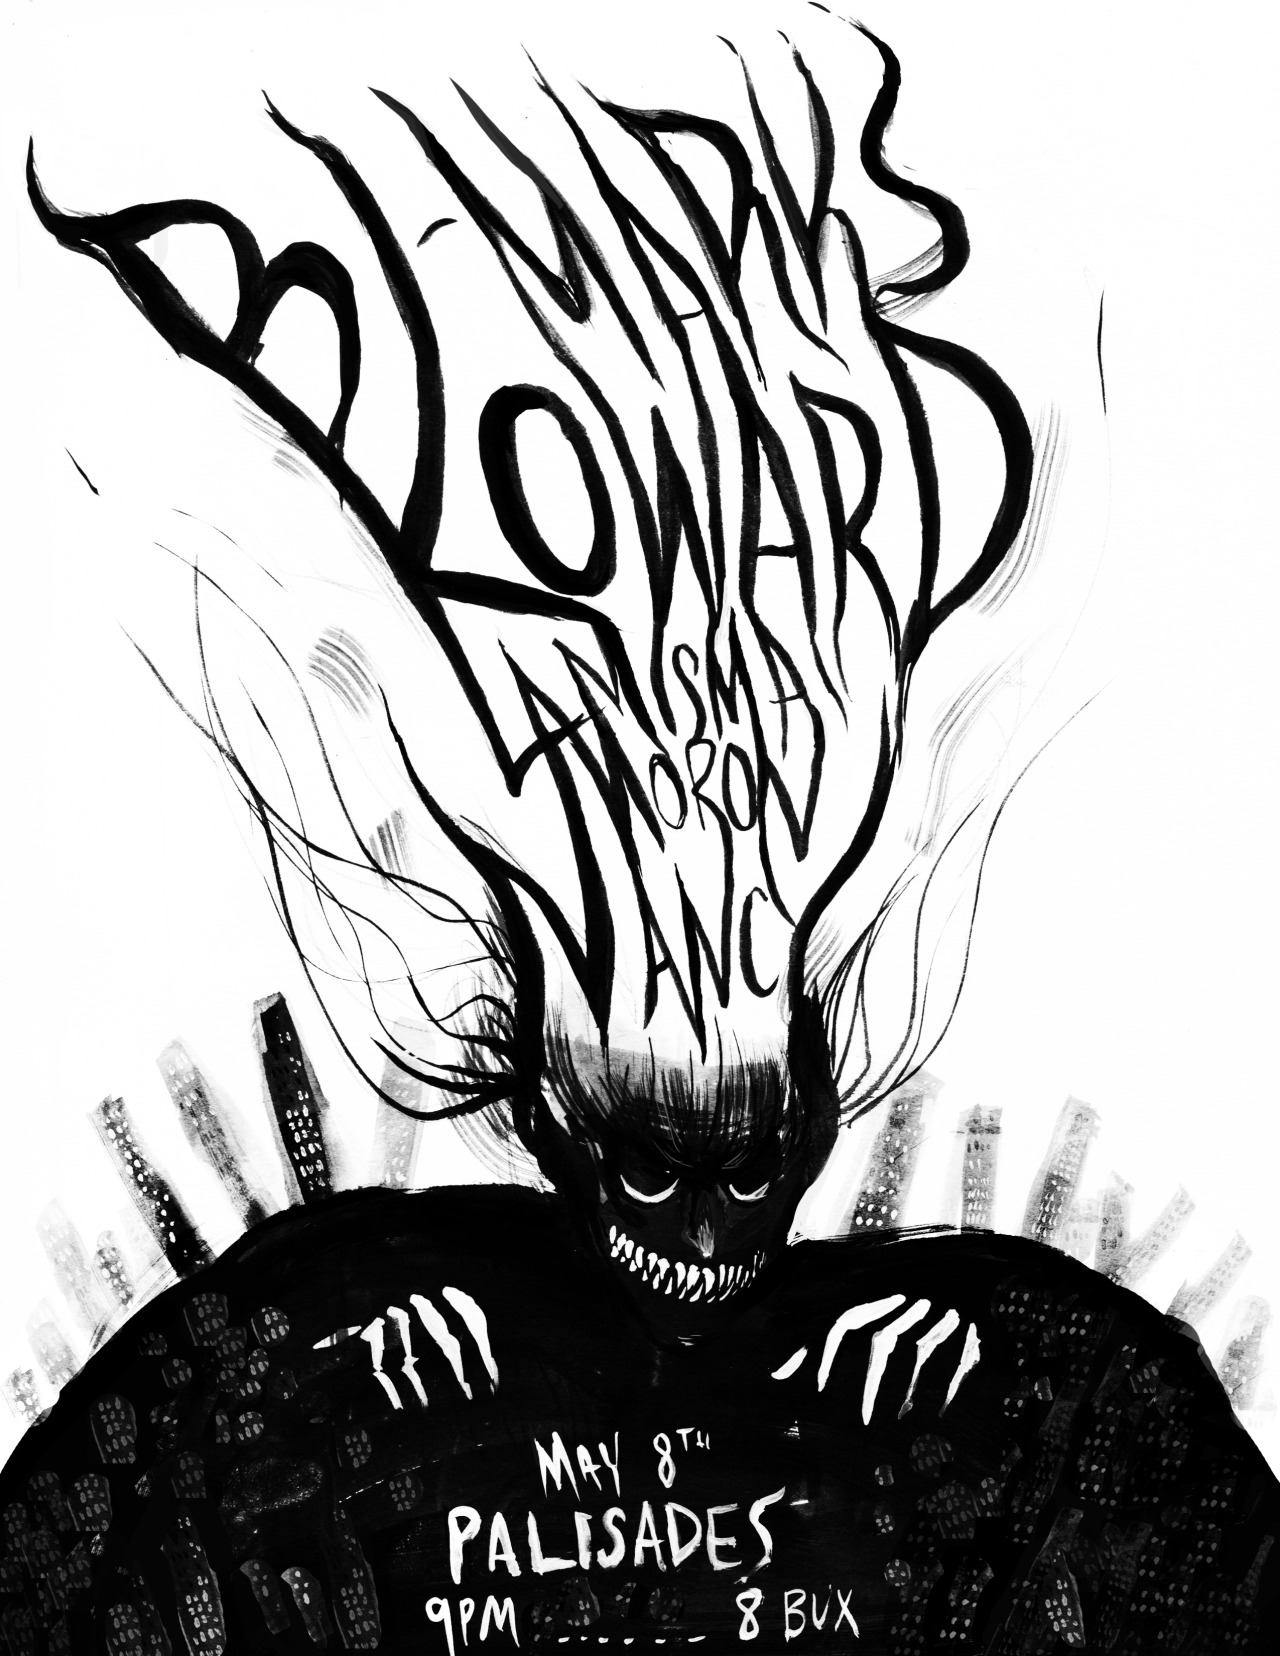 BIMARKS & KOWARD